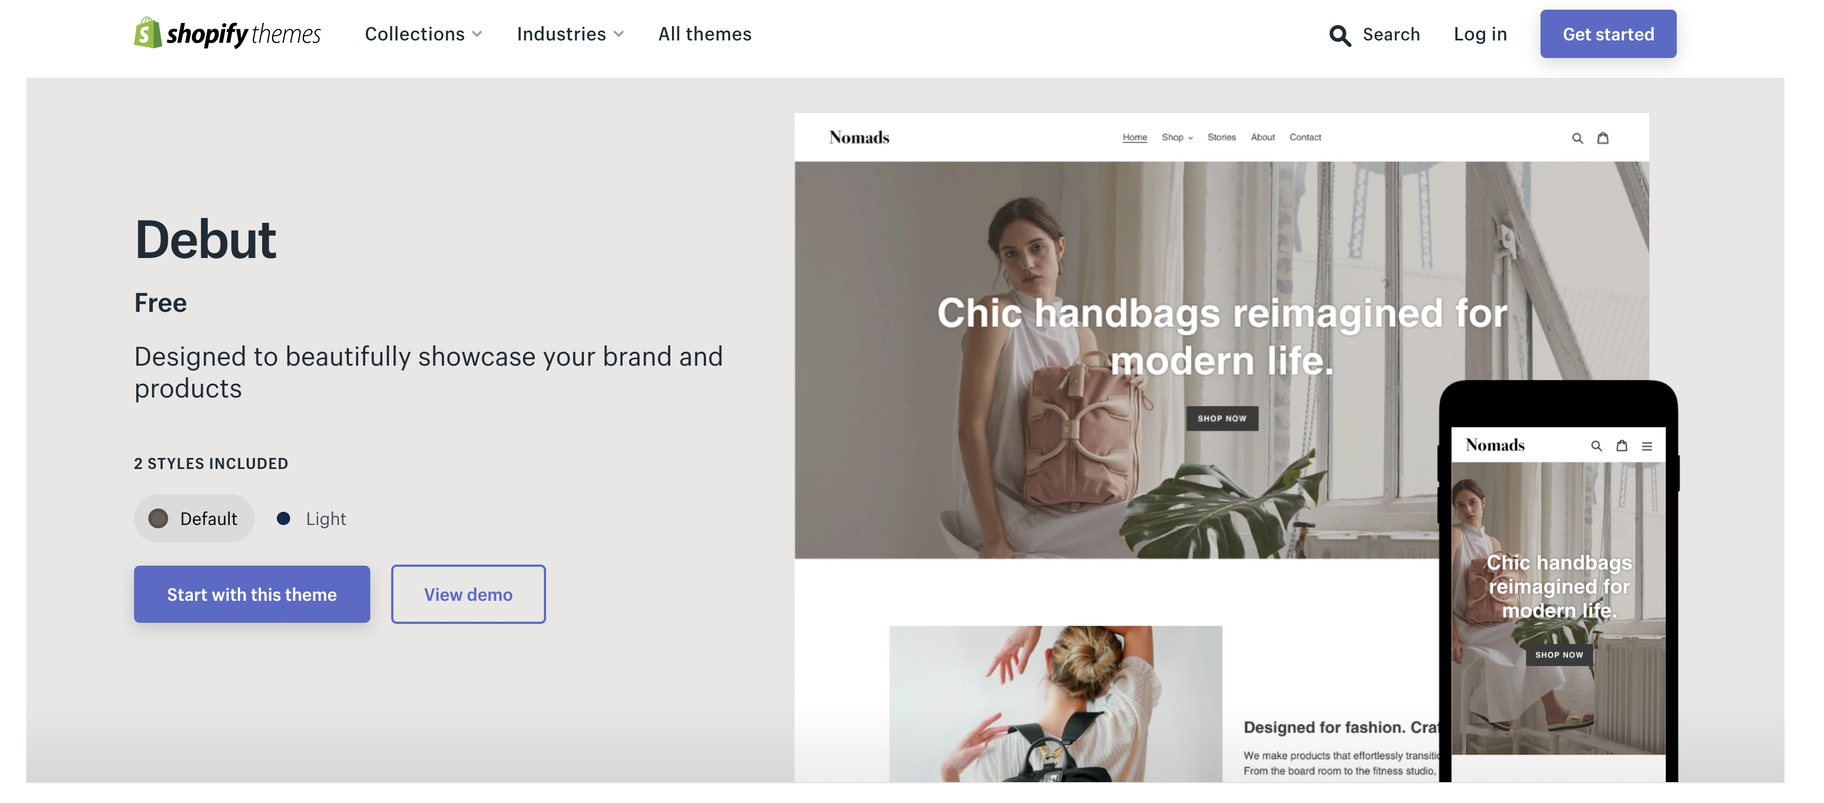 ücretsiz shopify temaları 2021